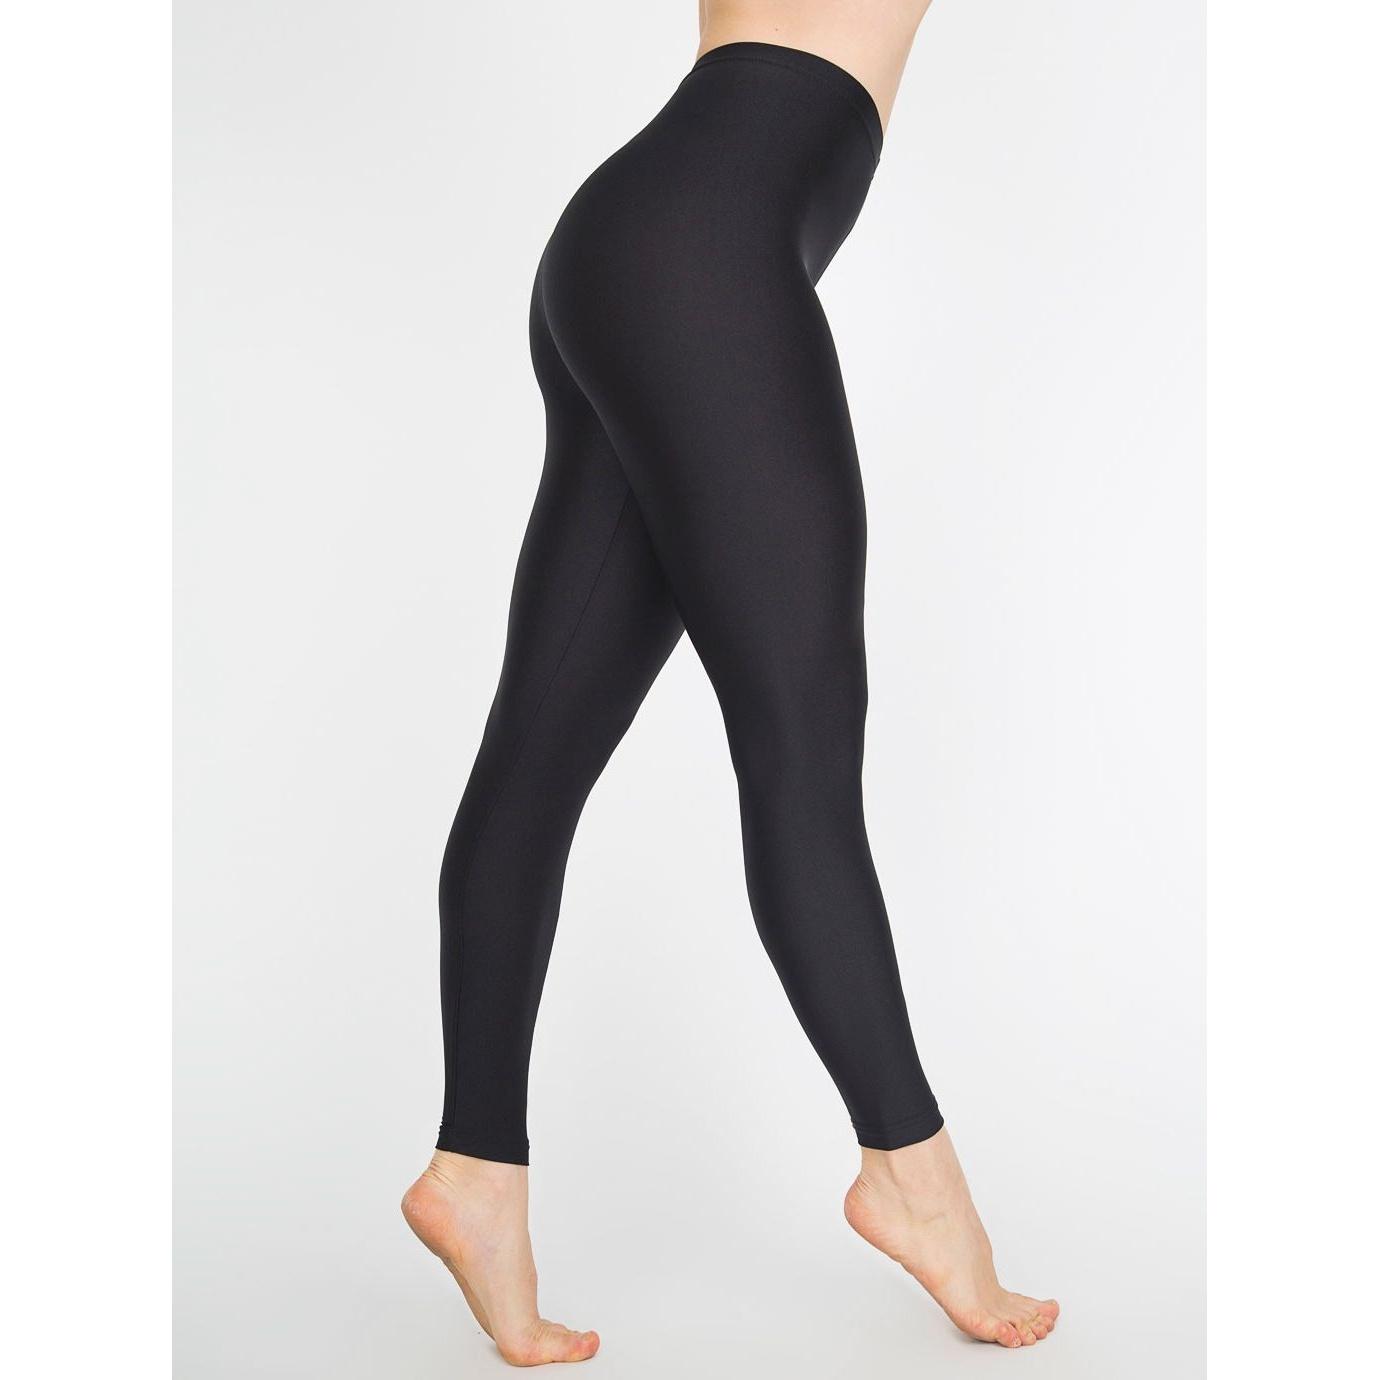 Fitness Leggings Amazon Uk: American Apparel Womens/Ladies Plain Shiny Nylon Leggings